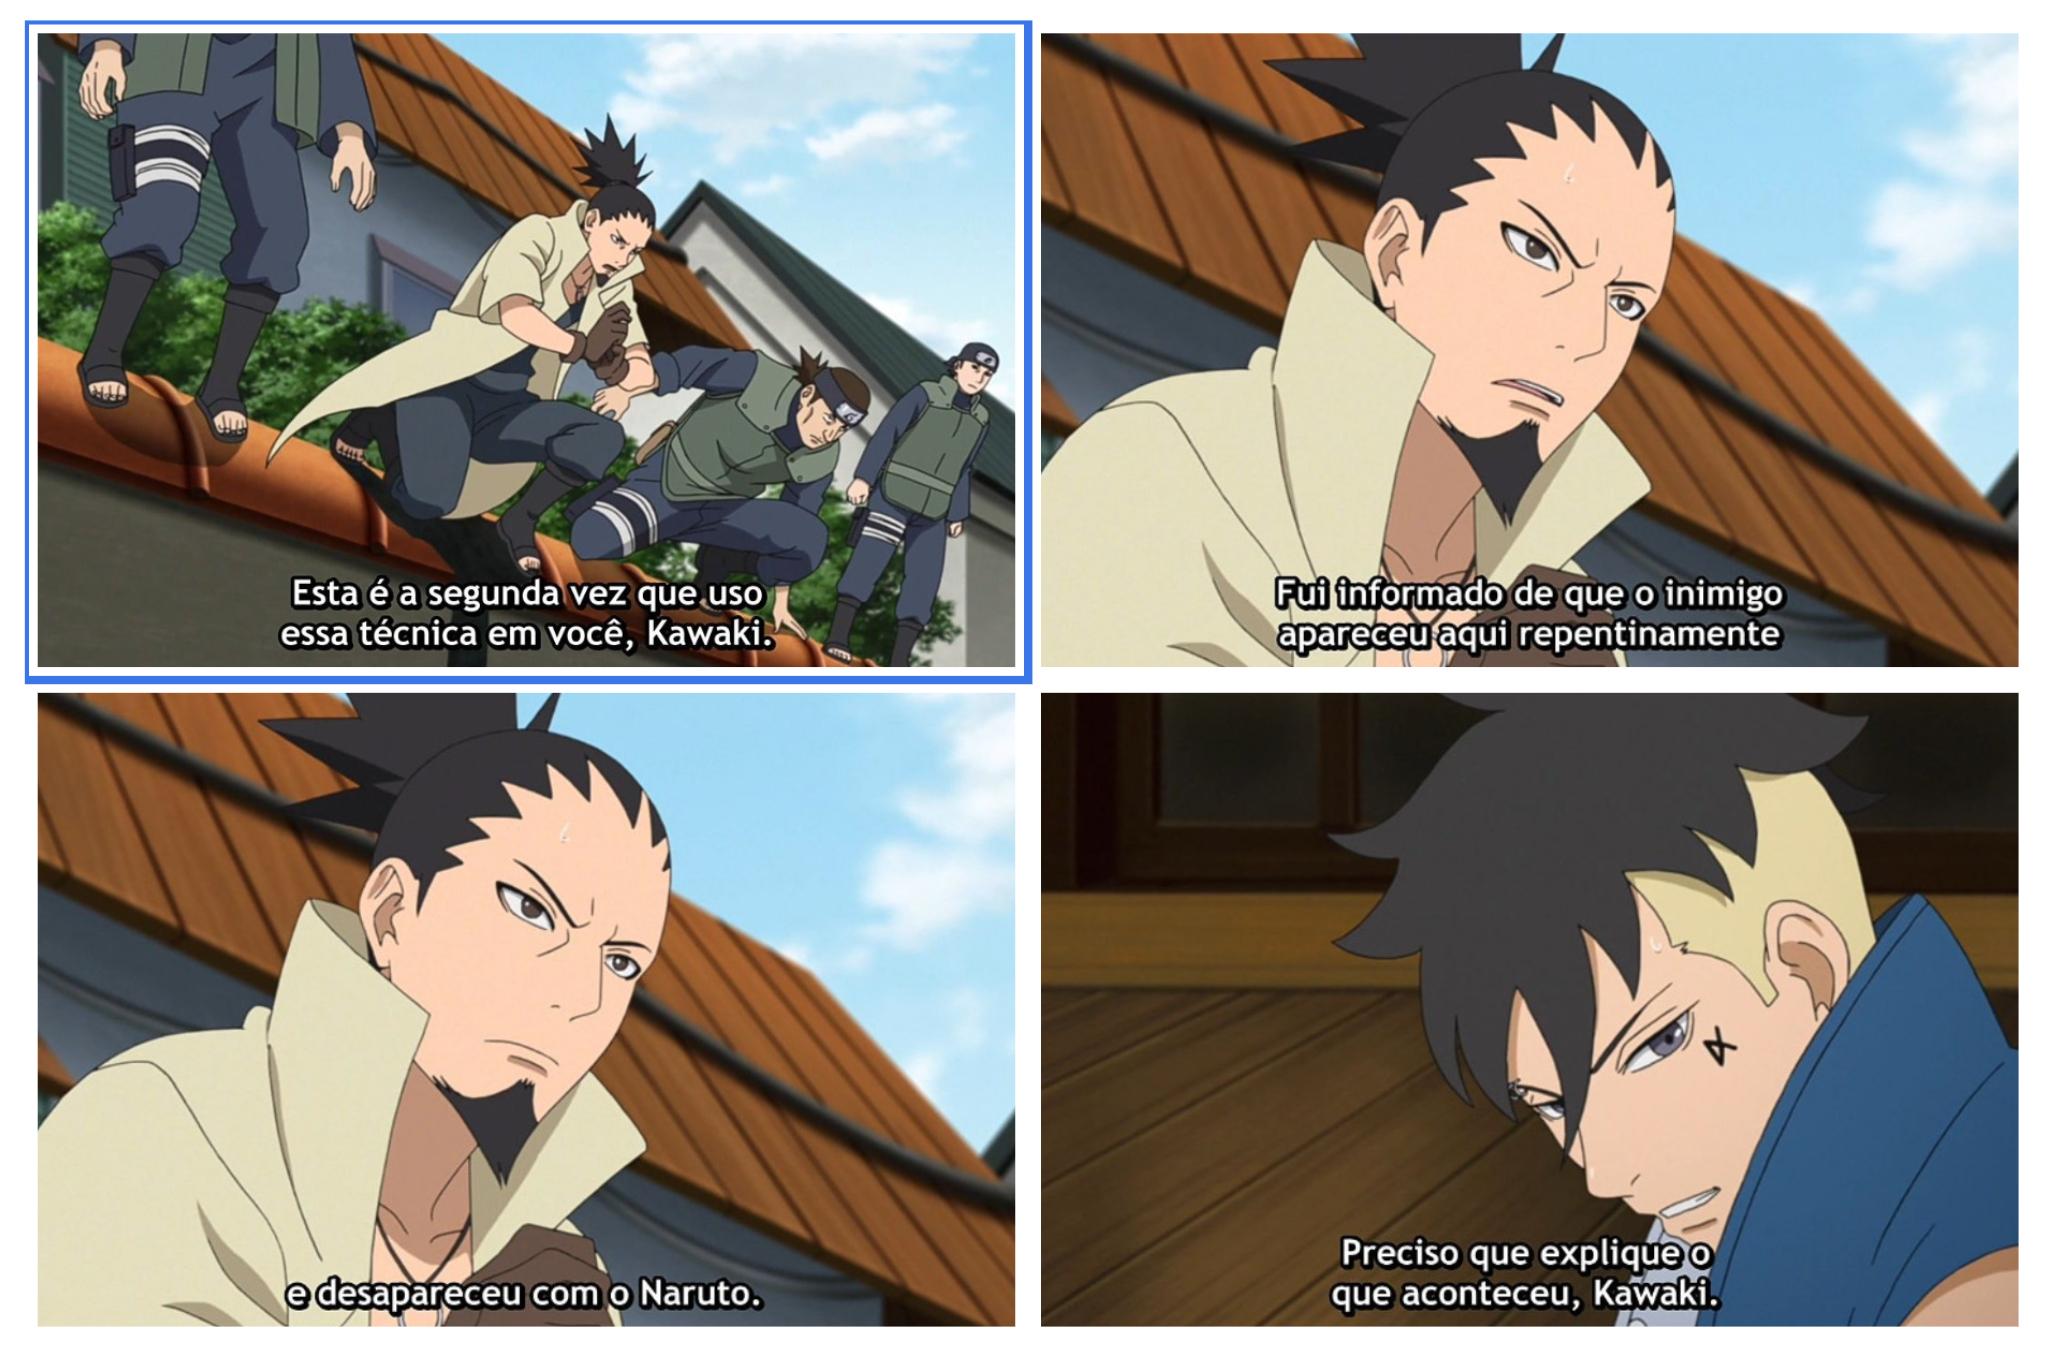 Shikamaru Detêm Kawaki no episódio 205